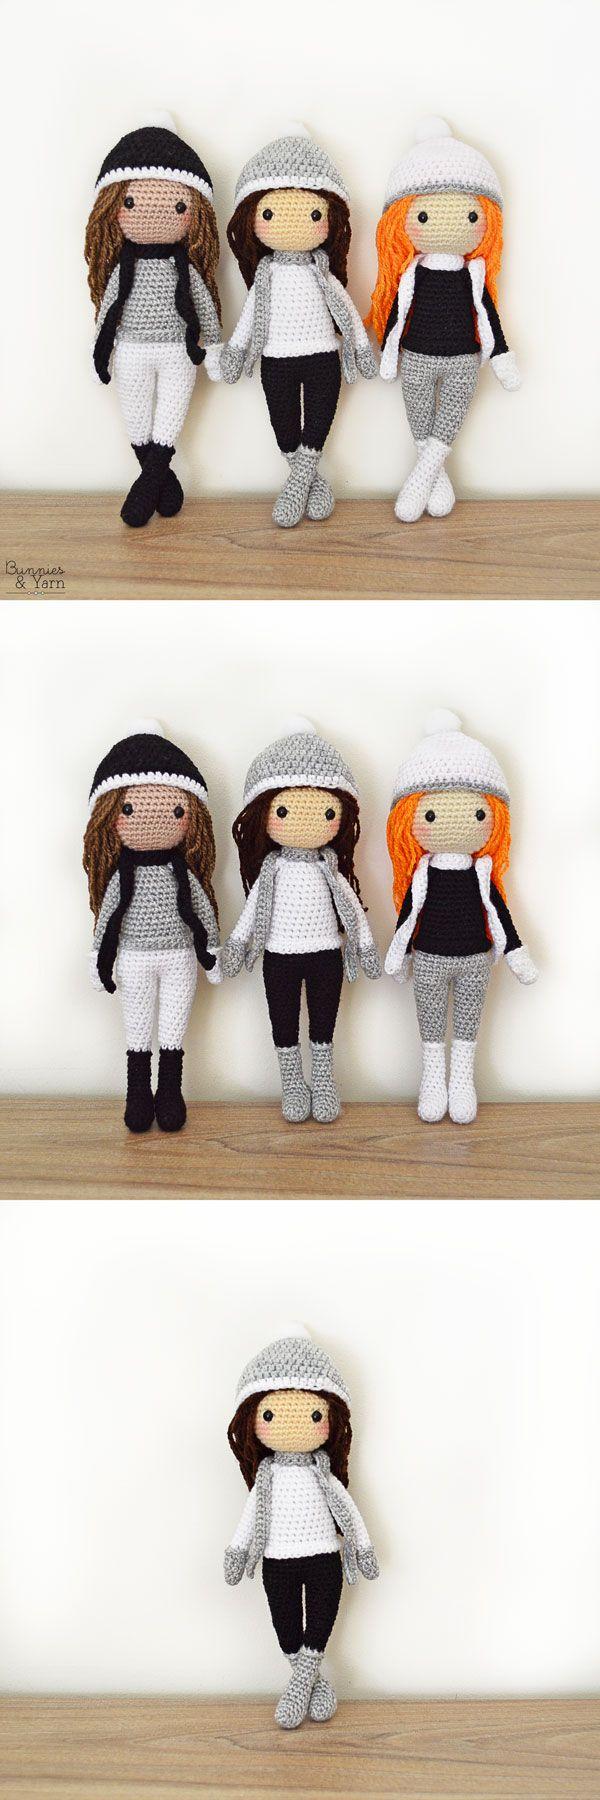 2344 best Amigurumi images on Pinterest | Crochet dolls, Crochet ...